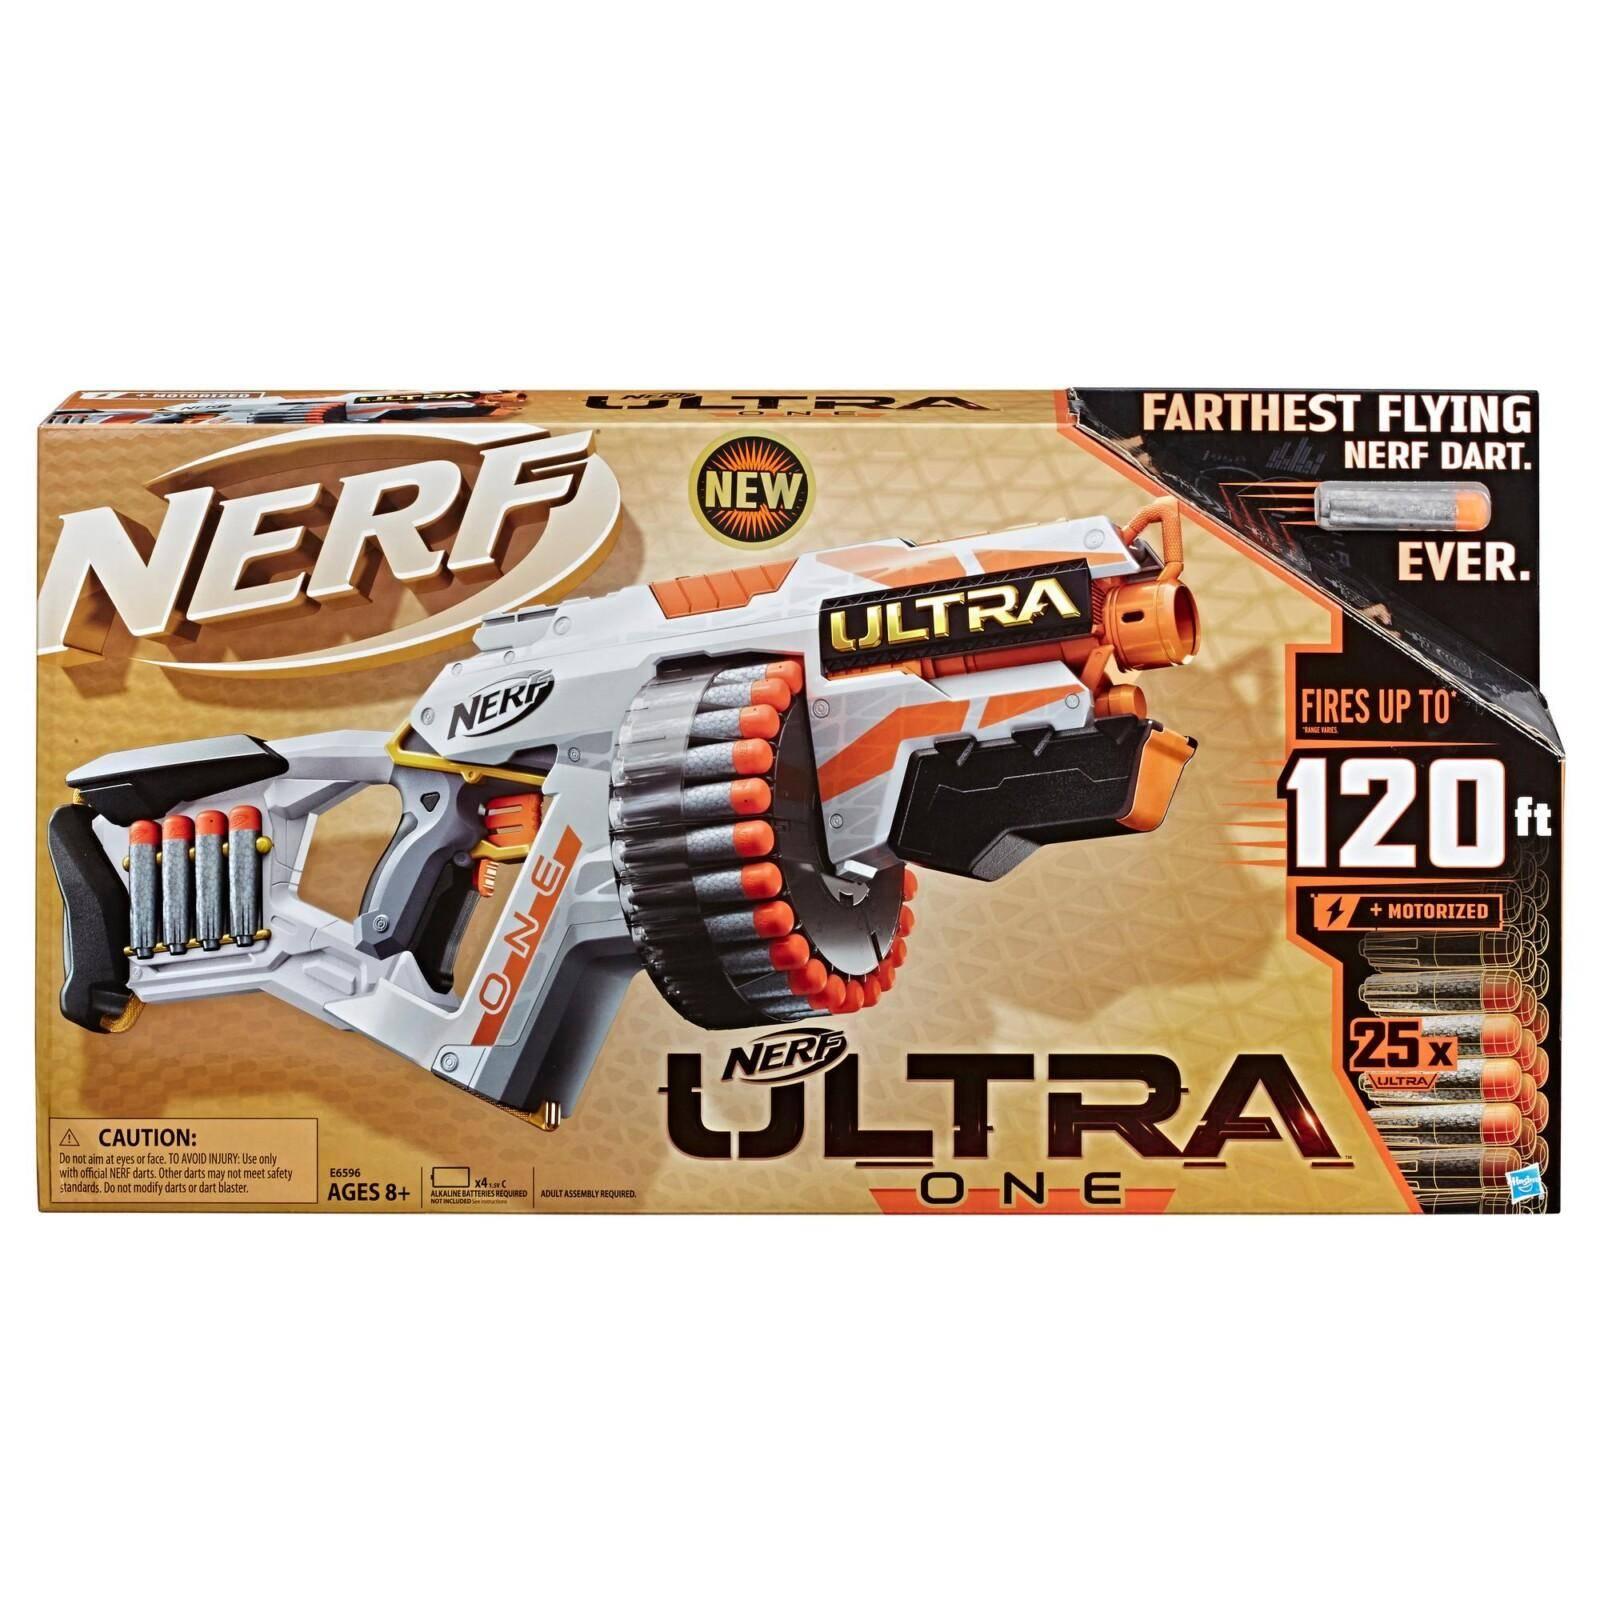 nerf ultra one hasbro